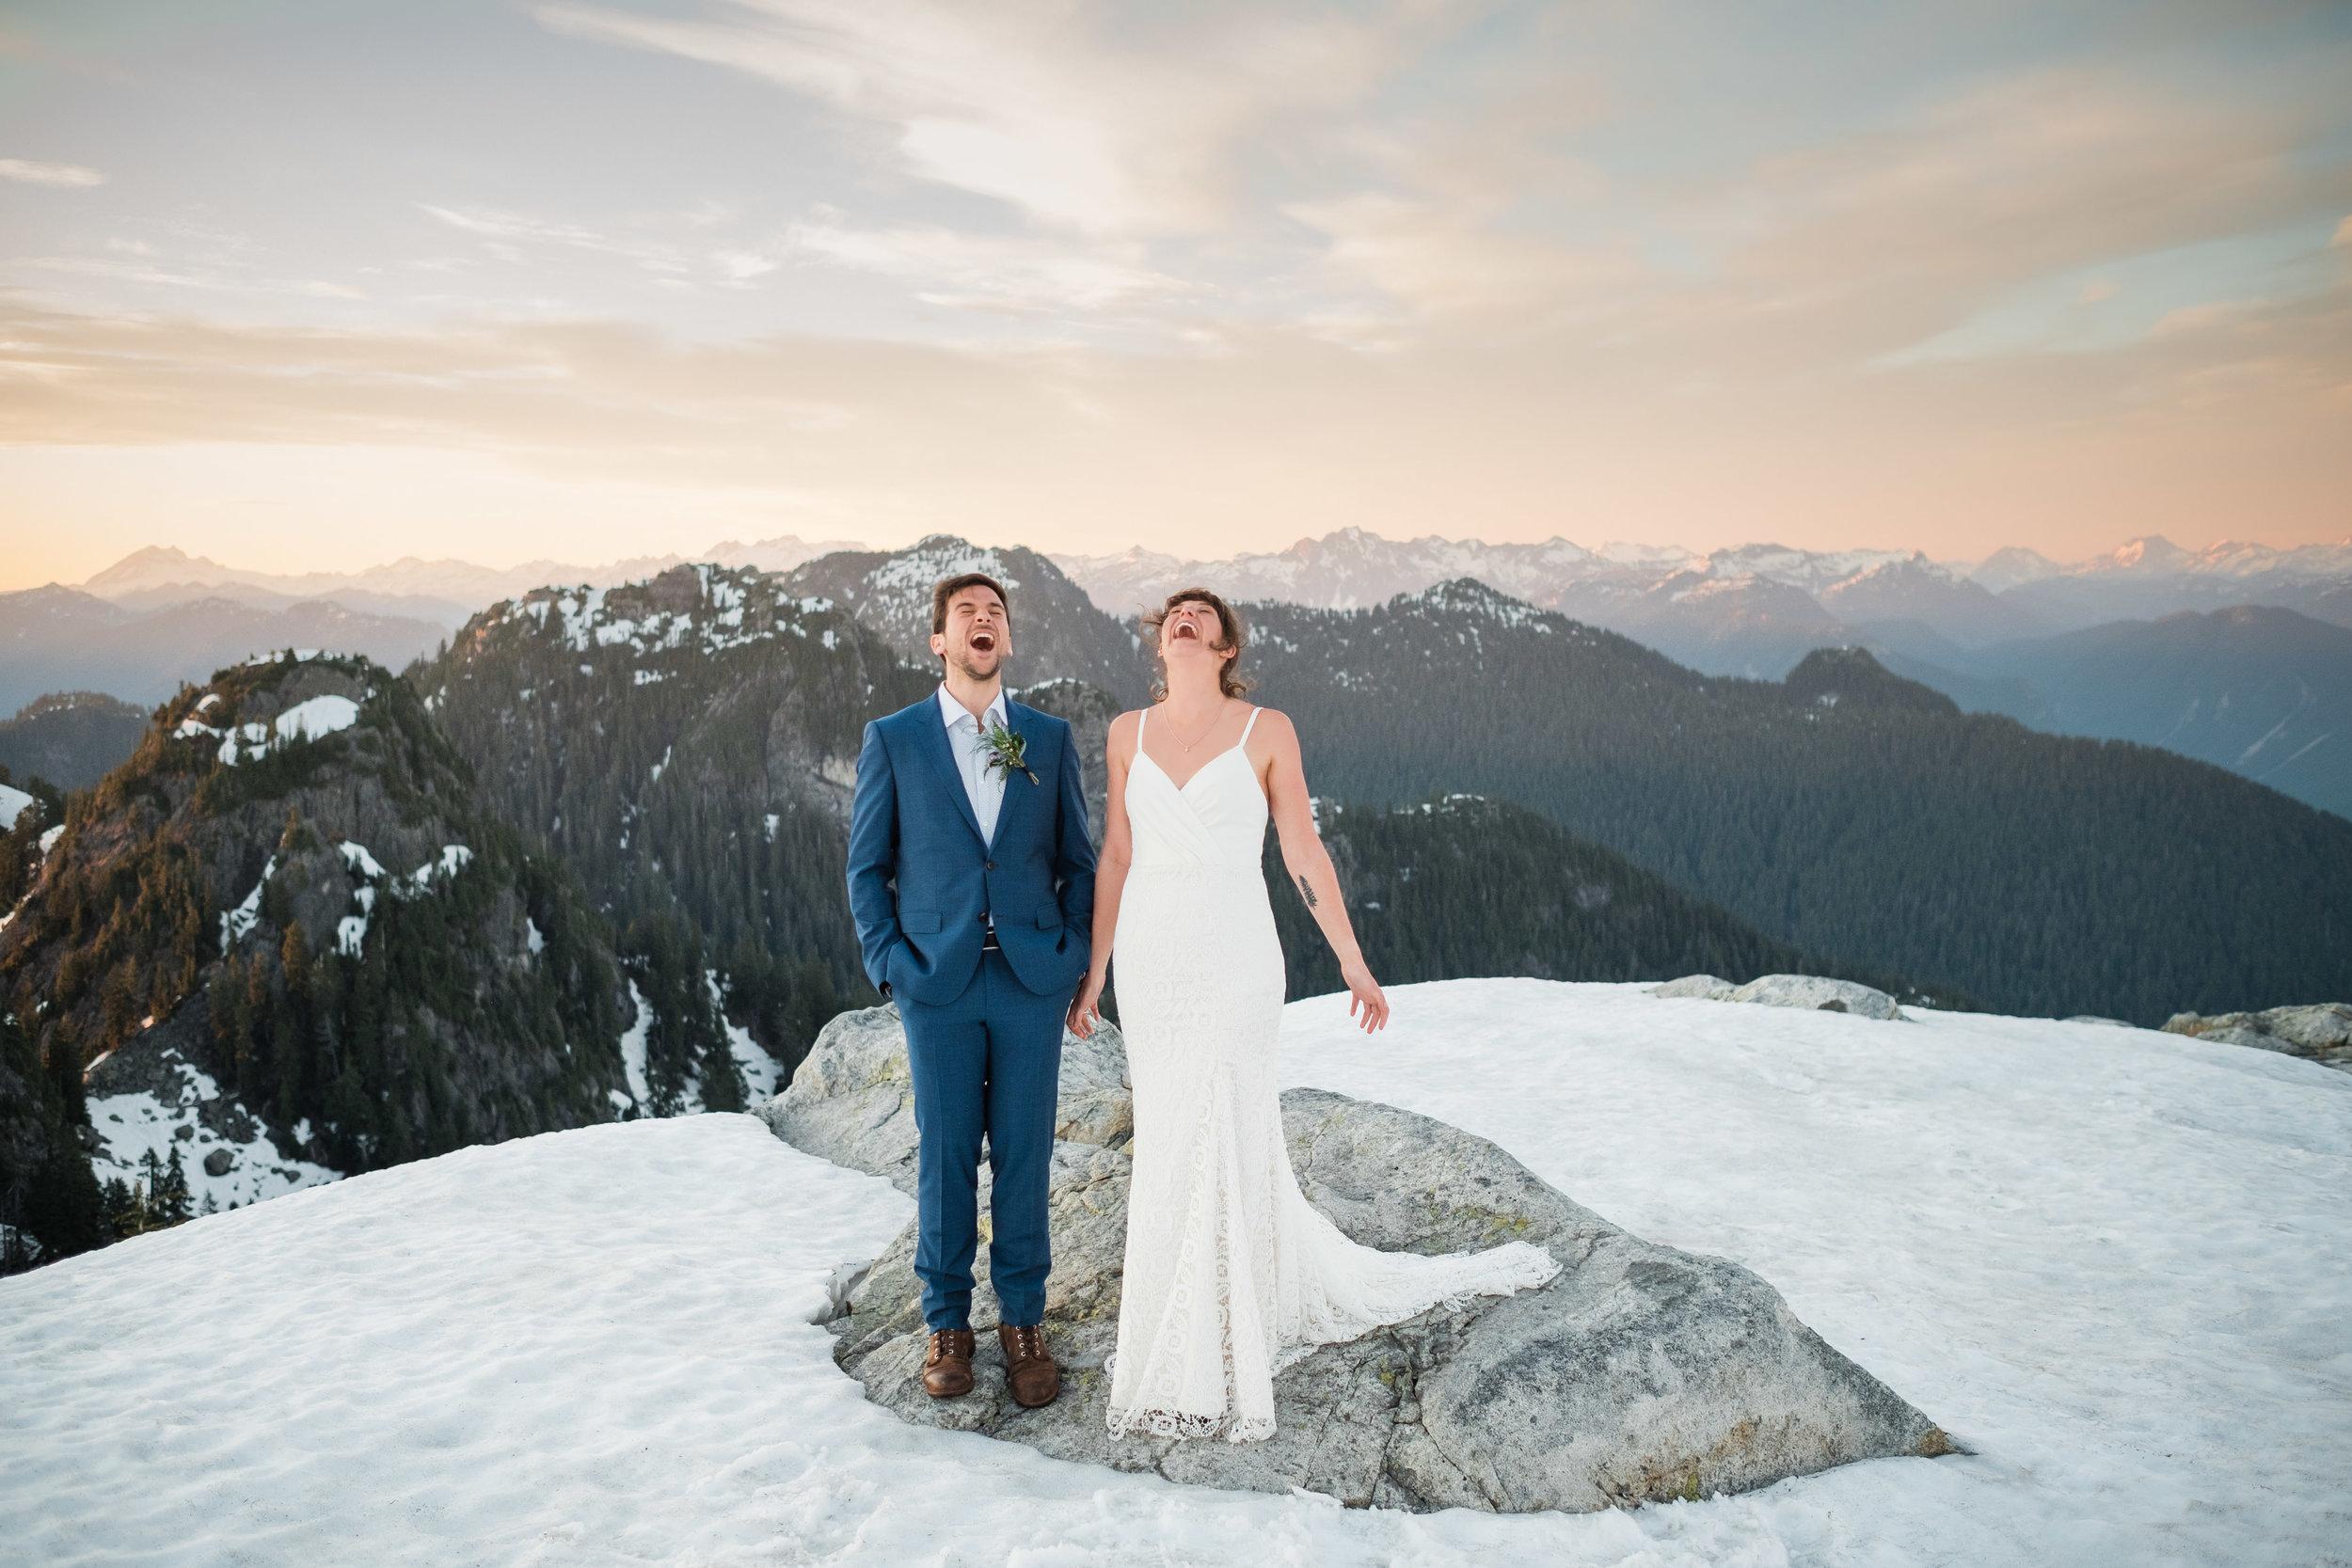 Mt-Seymour-styled-shoot-0088-jelger-tanja-photographers.jpg